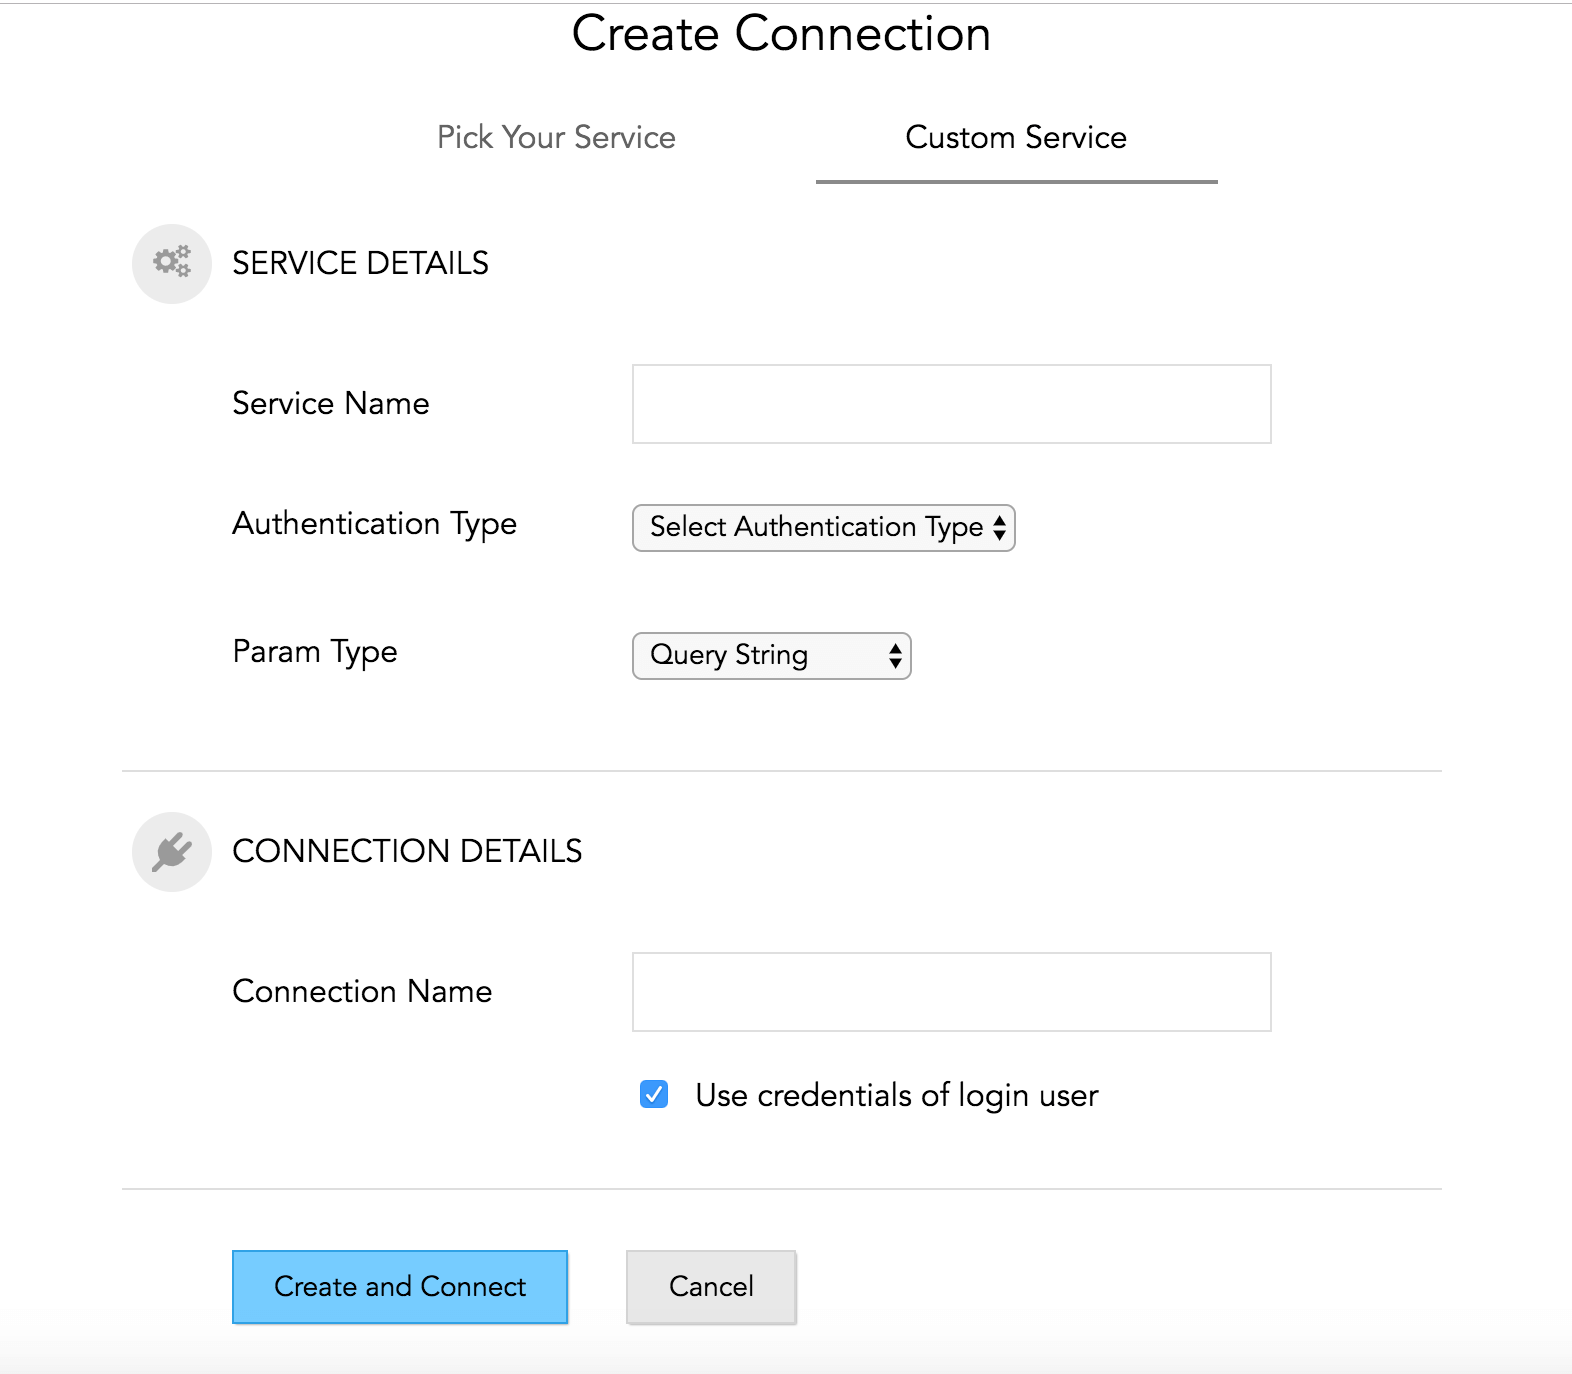 New Custom Connection